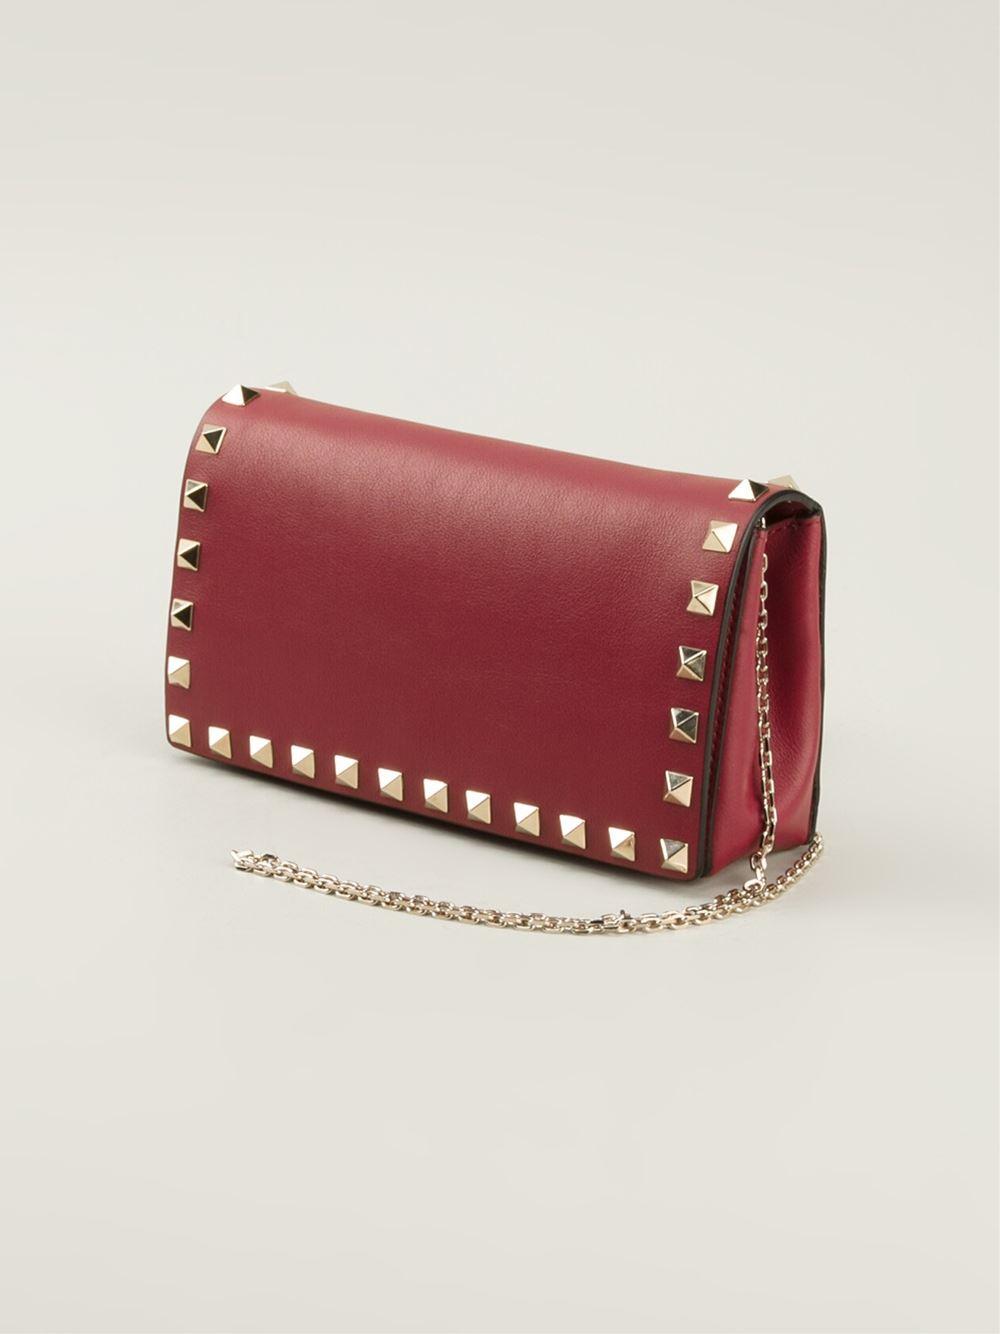 Valentino Mini Rockstud Chain Shoulder Bag In Red Lyst